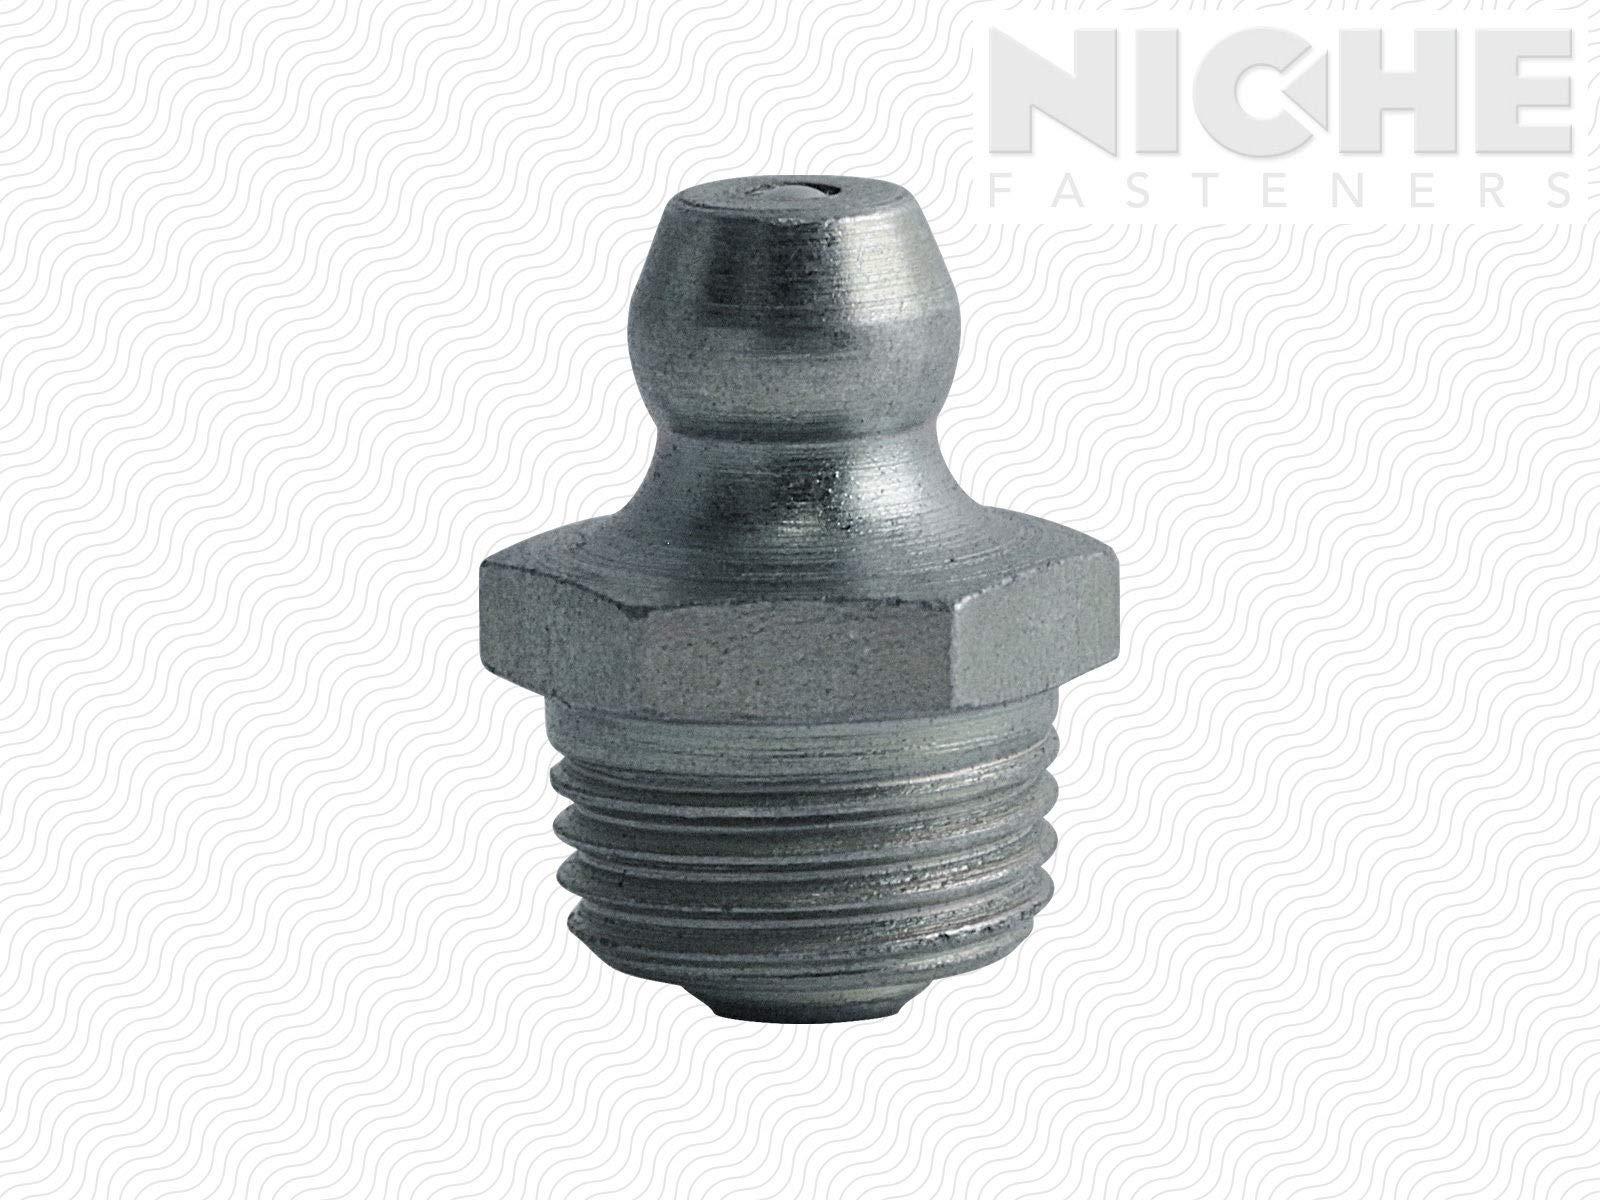 Grease Fitting Zerk 1/8-27 PTF Steel ZC Triv (100 Pieces)